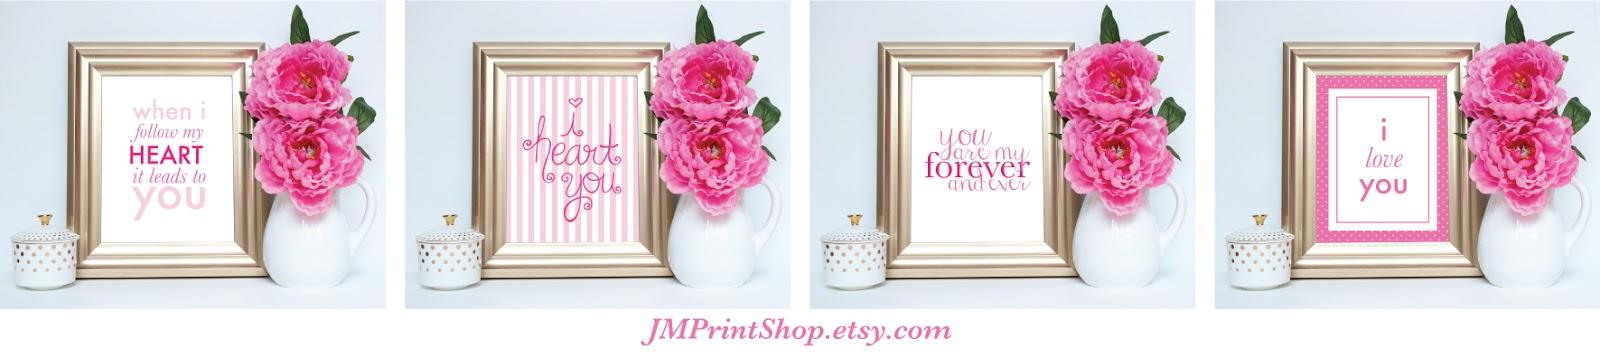 Valentine's Day Printables by JMPrintShop.etsy.com